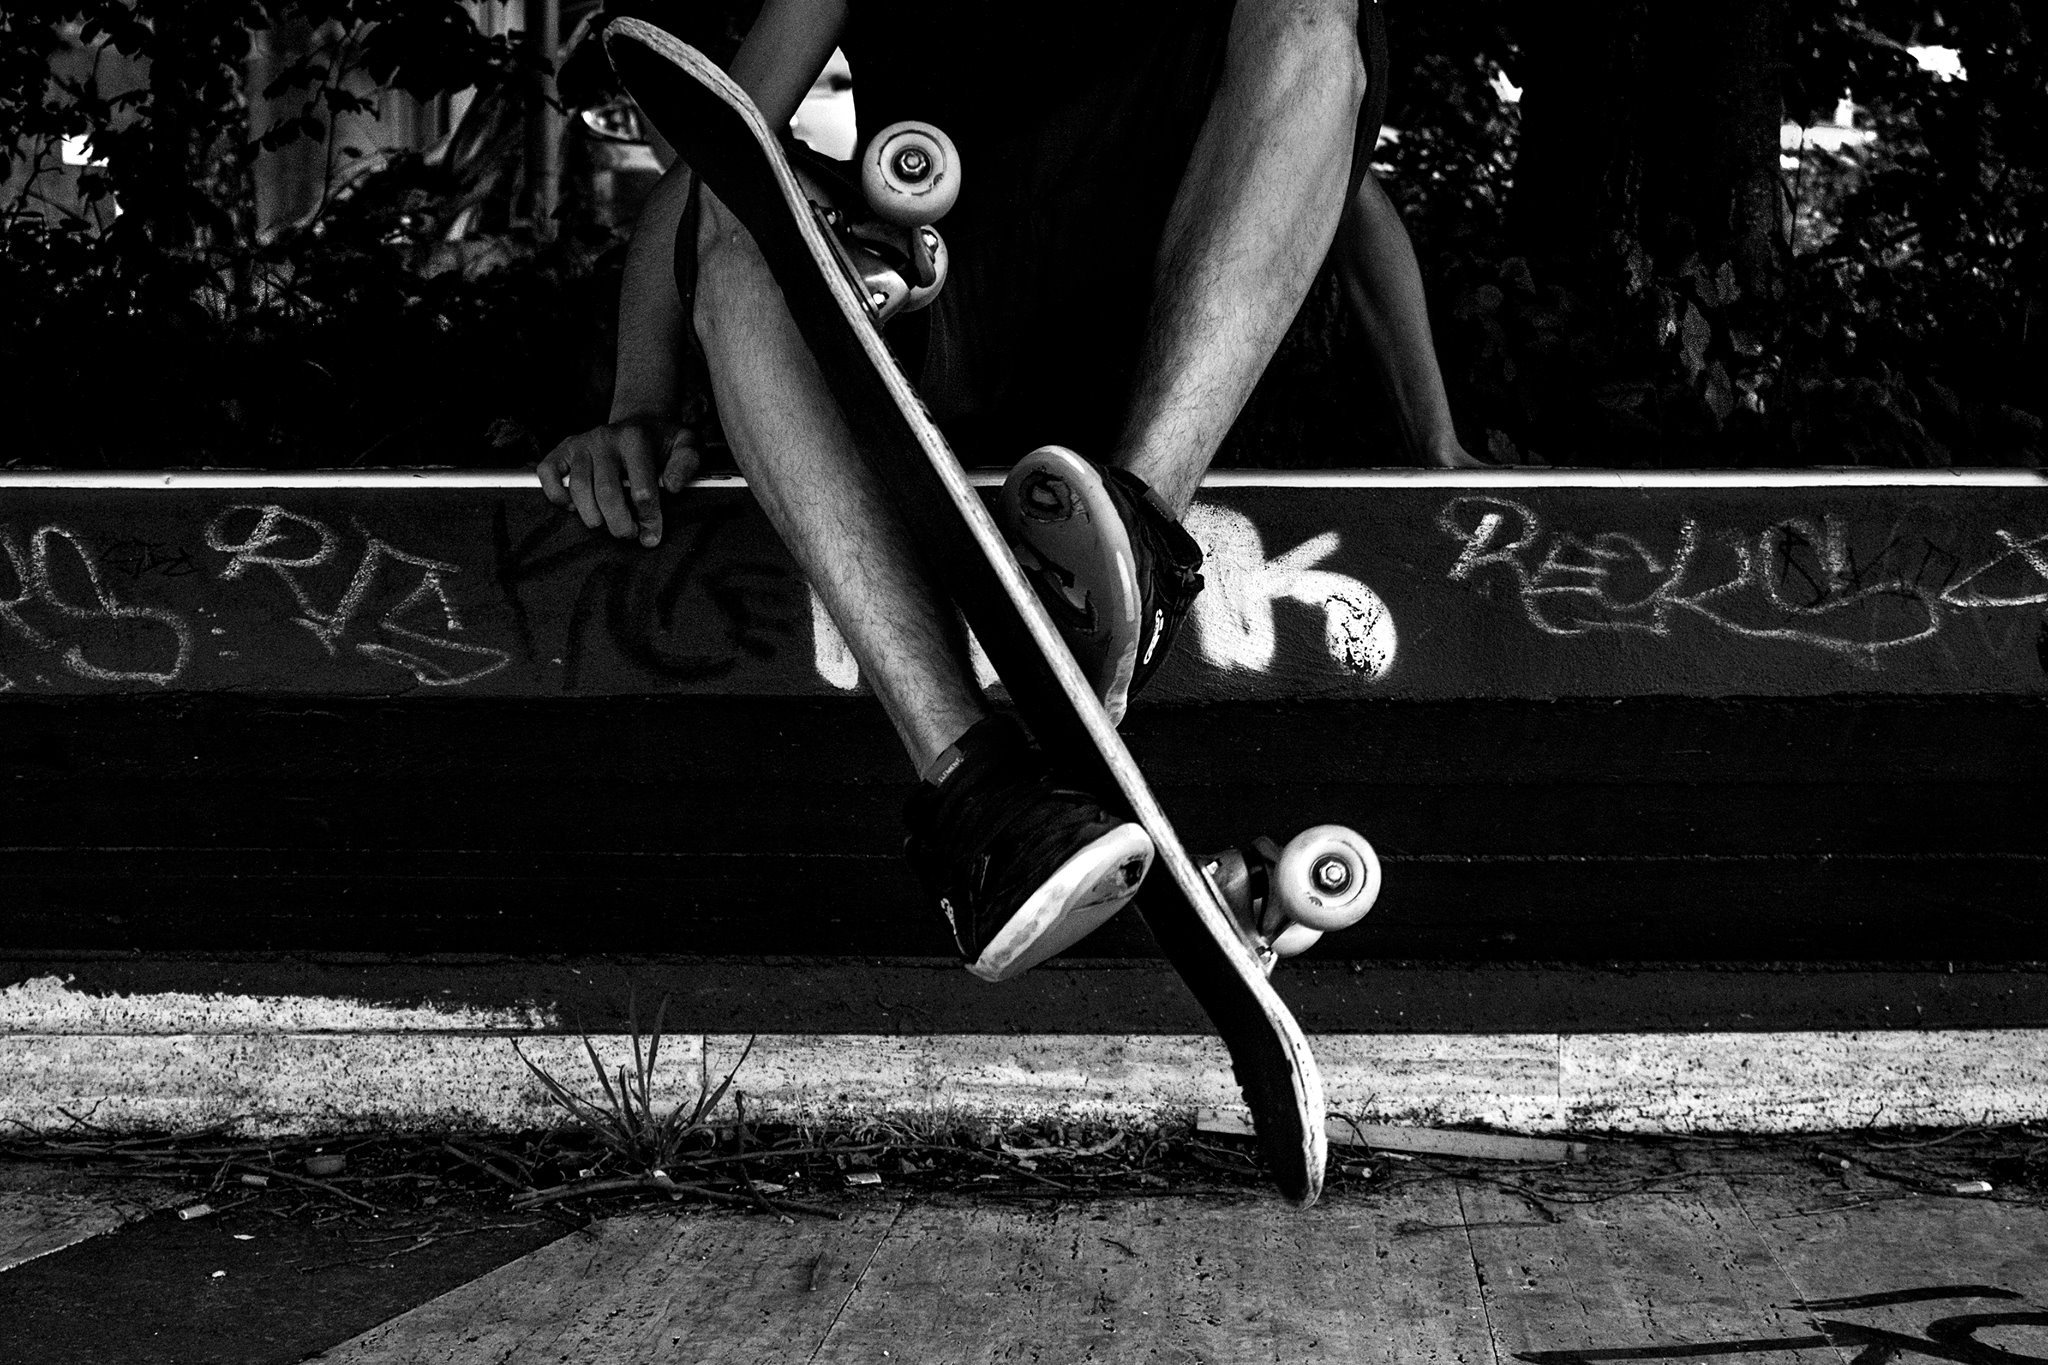 Legs #3 by Chiara Gastone